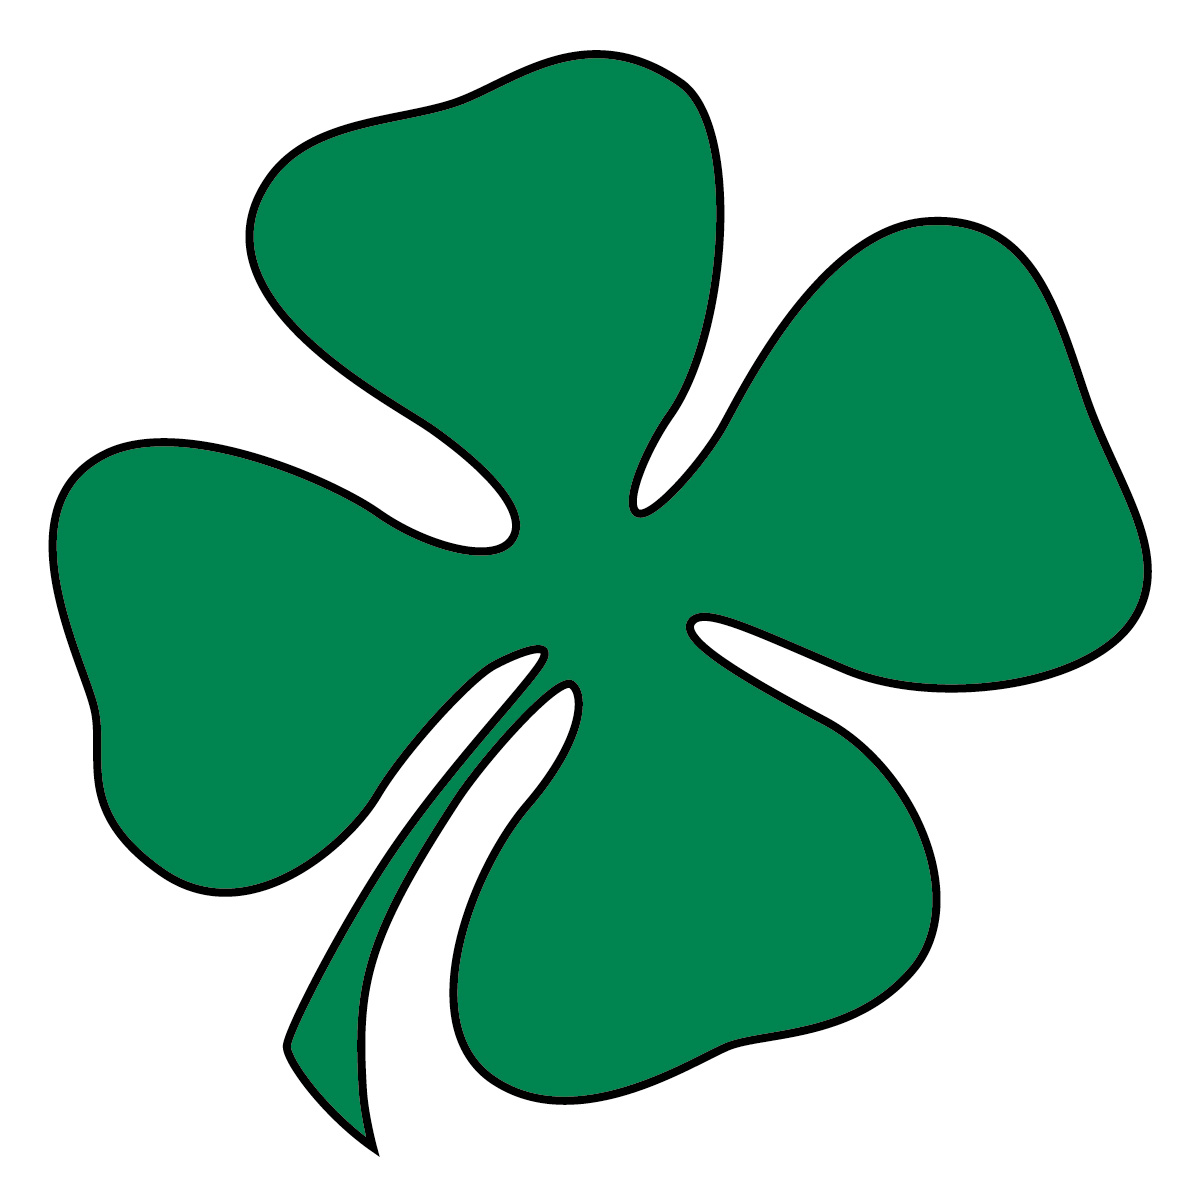 Irish ireland clip art free clipart images 2.